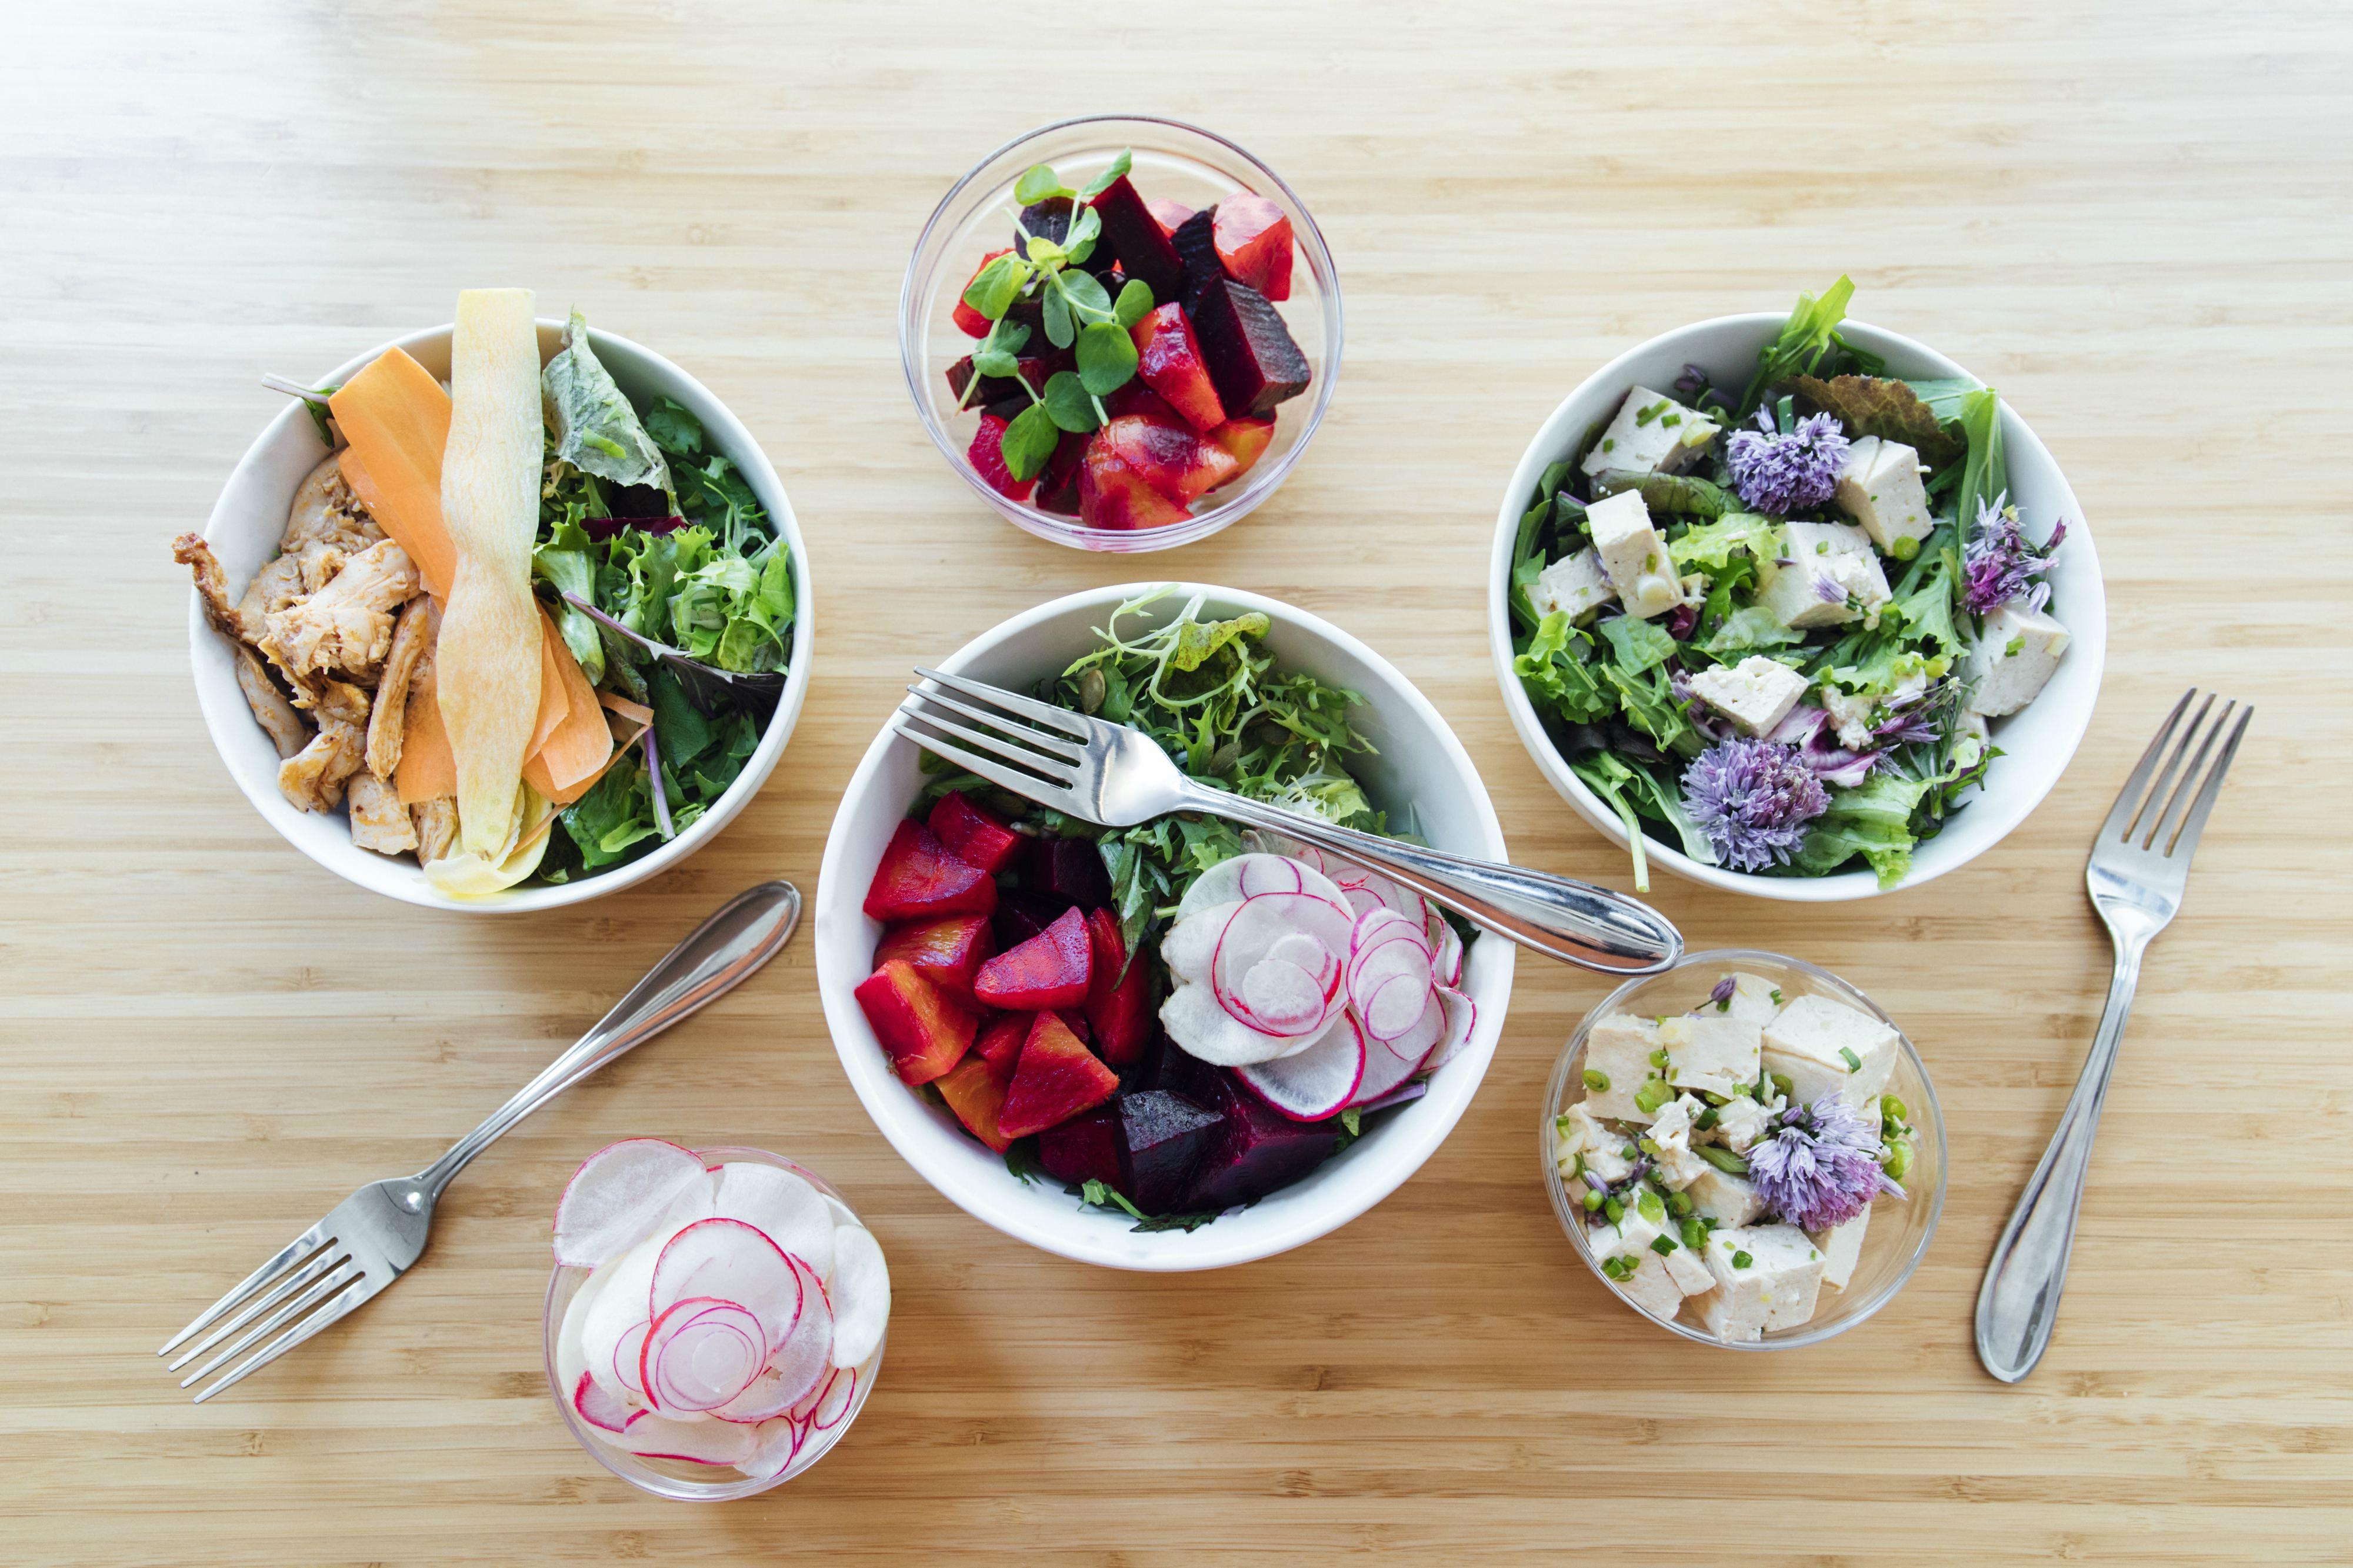 Office Menu Refresh - Changing Food Tastes